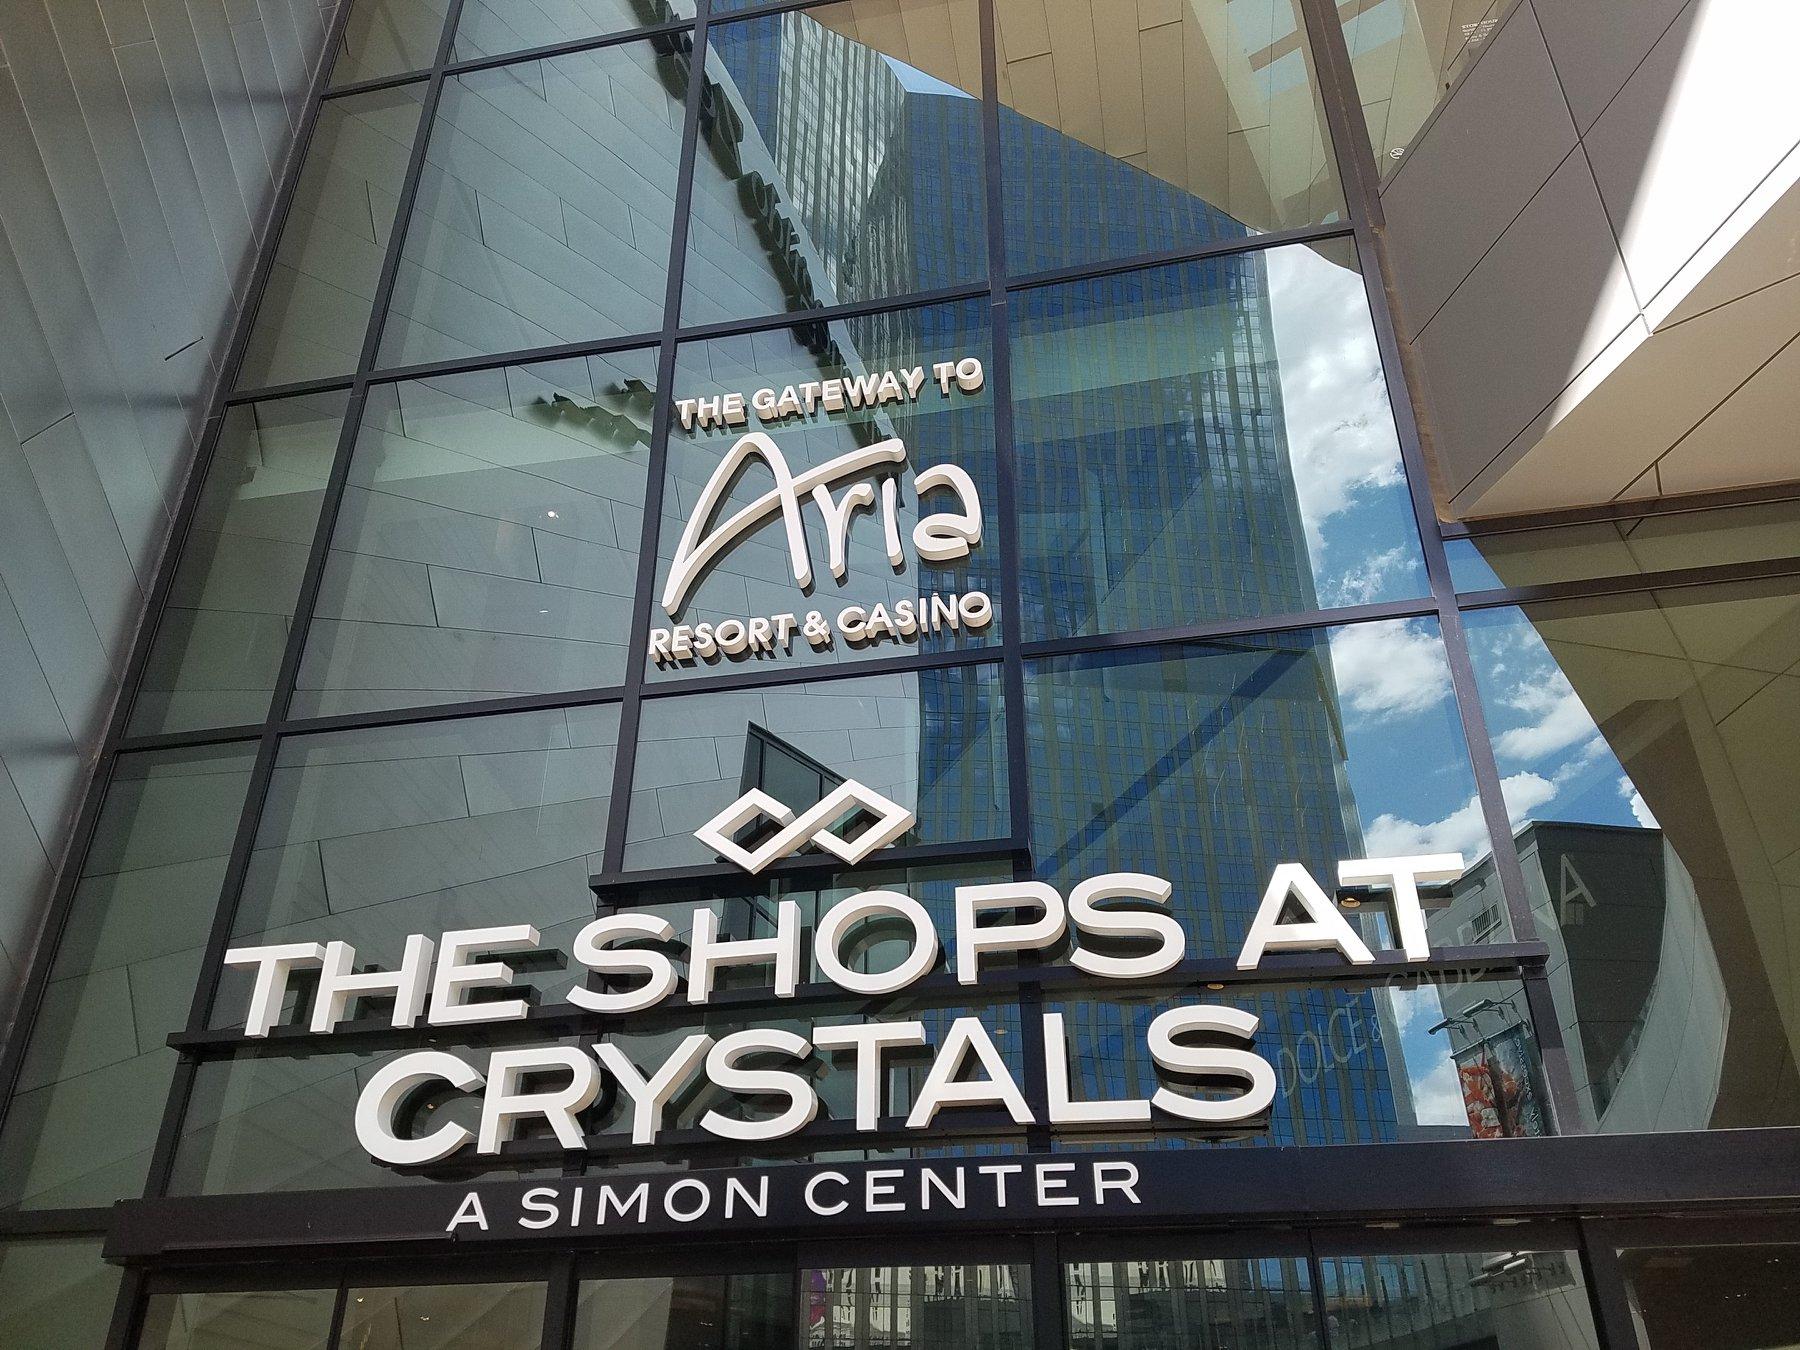 aria-crysals-signage-lindsay-burns-stylist.jpg